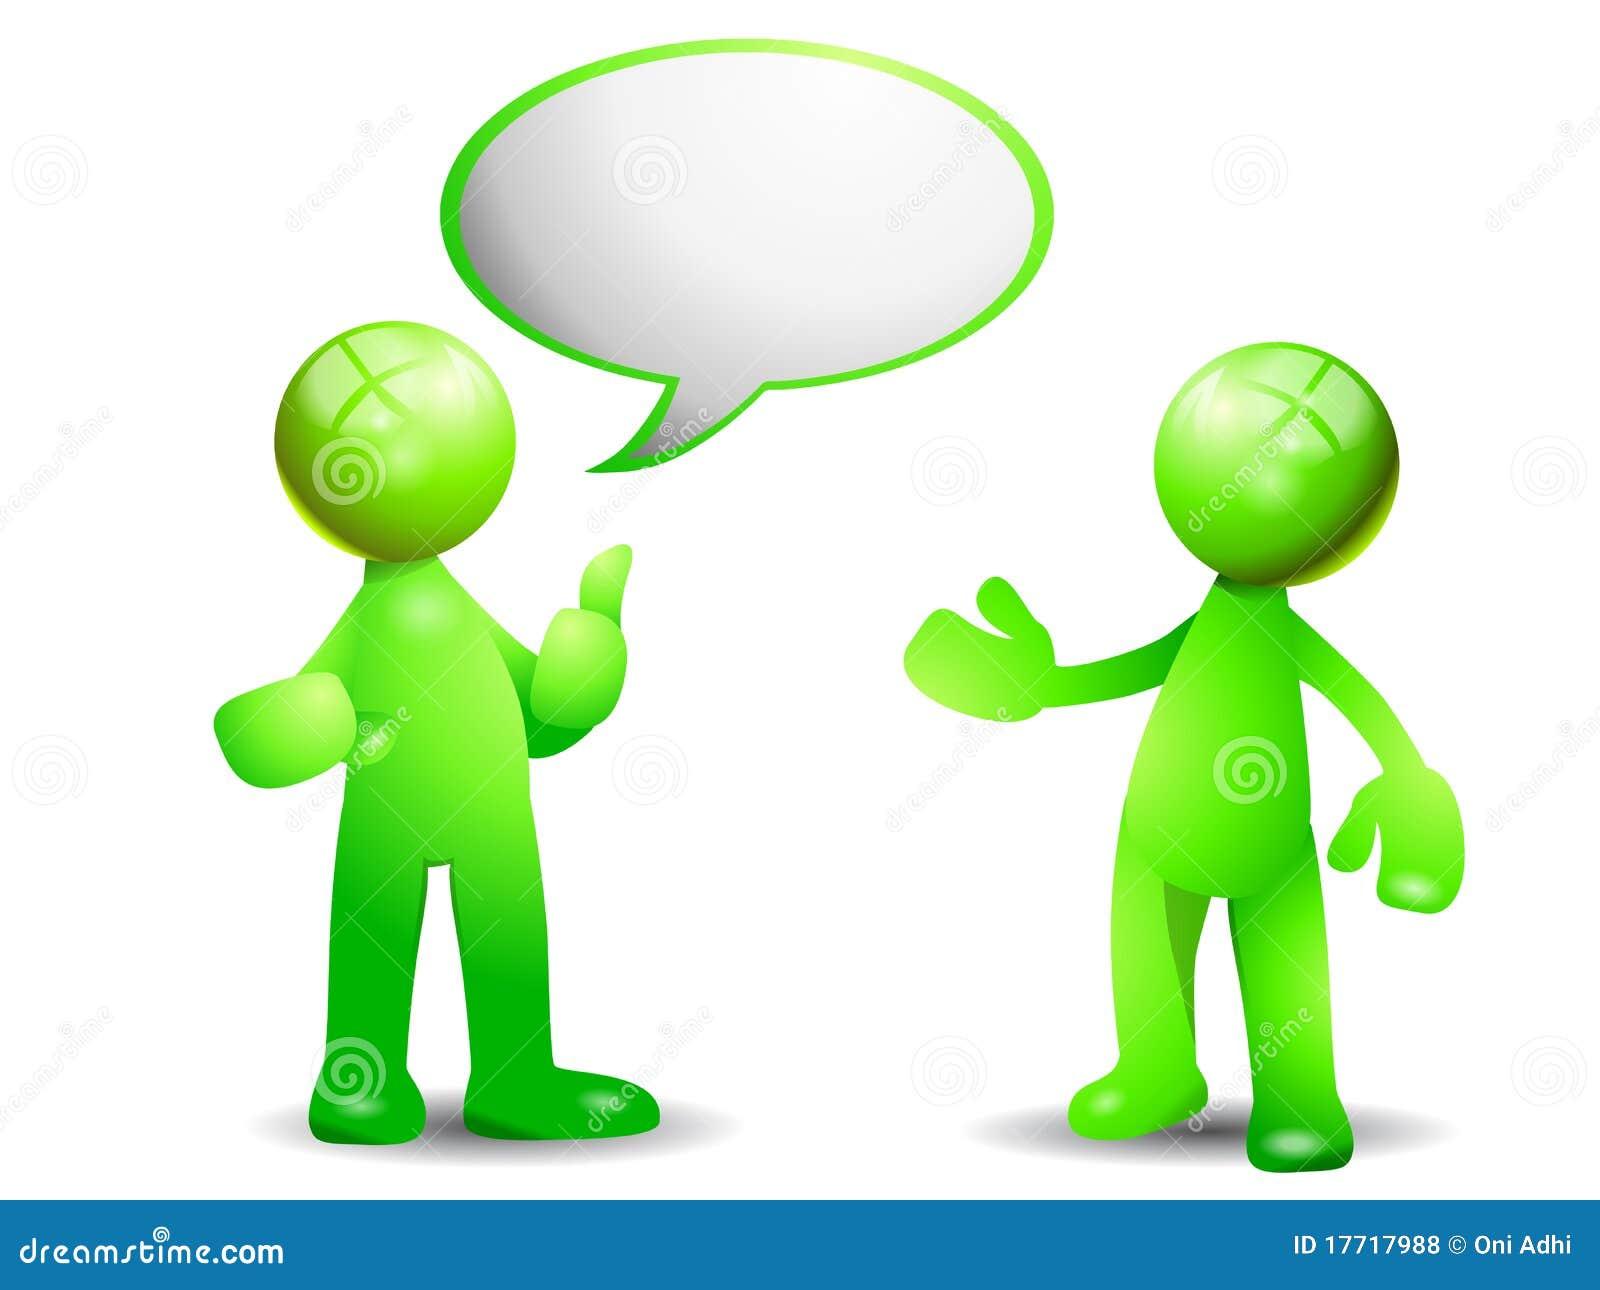 Green conversation